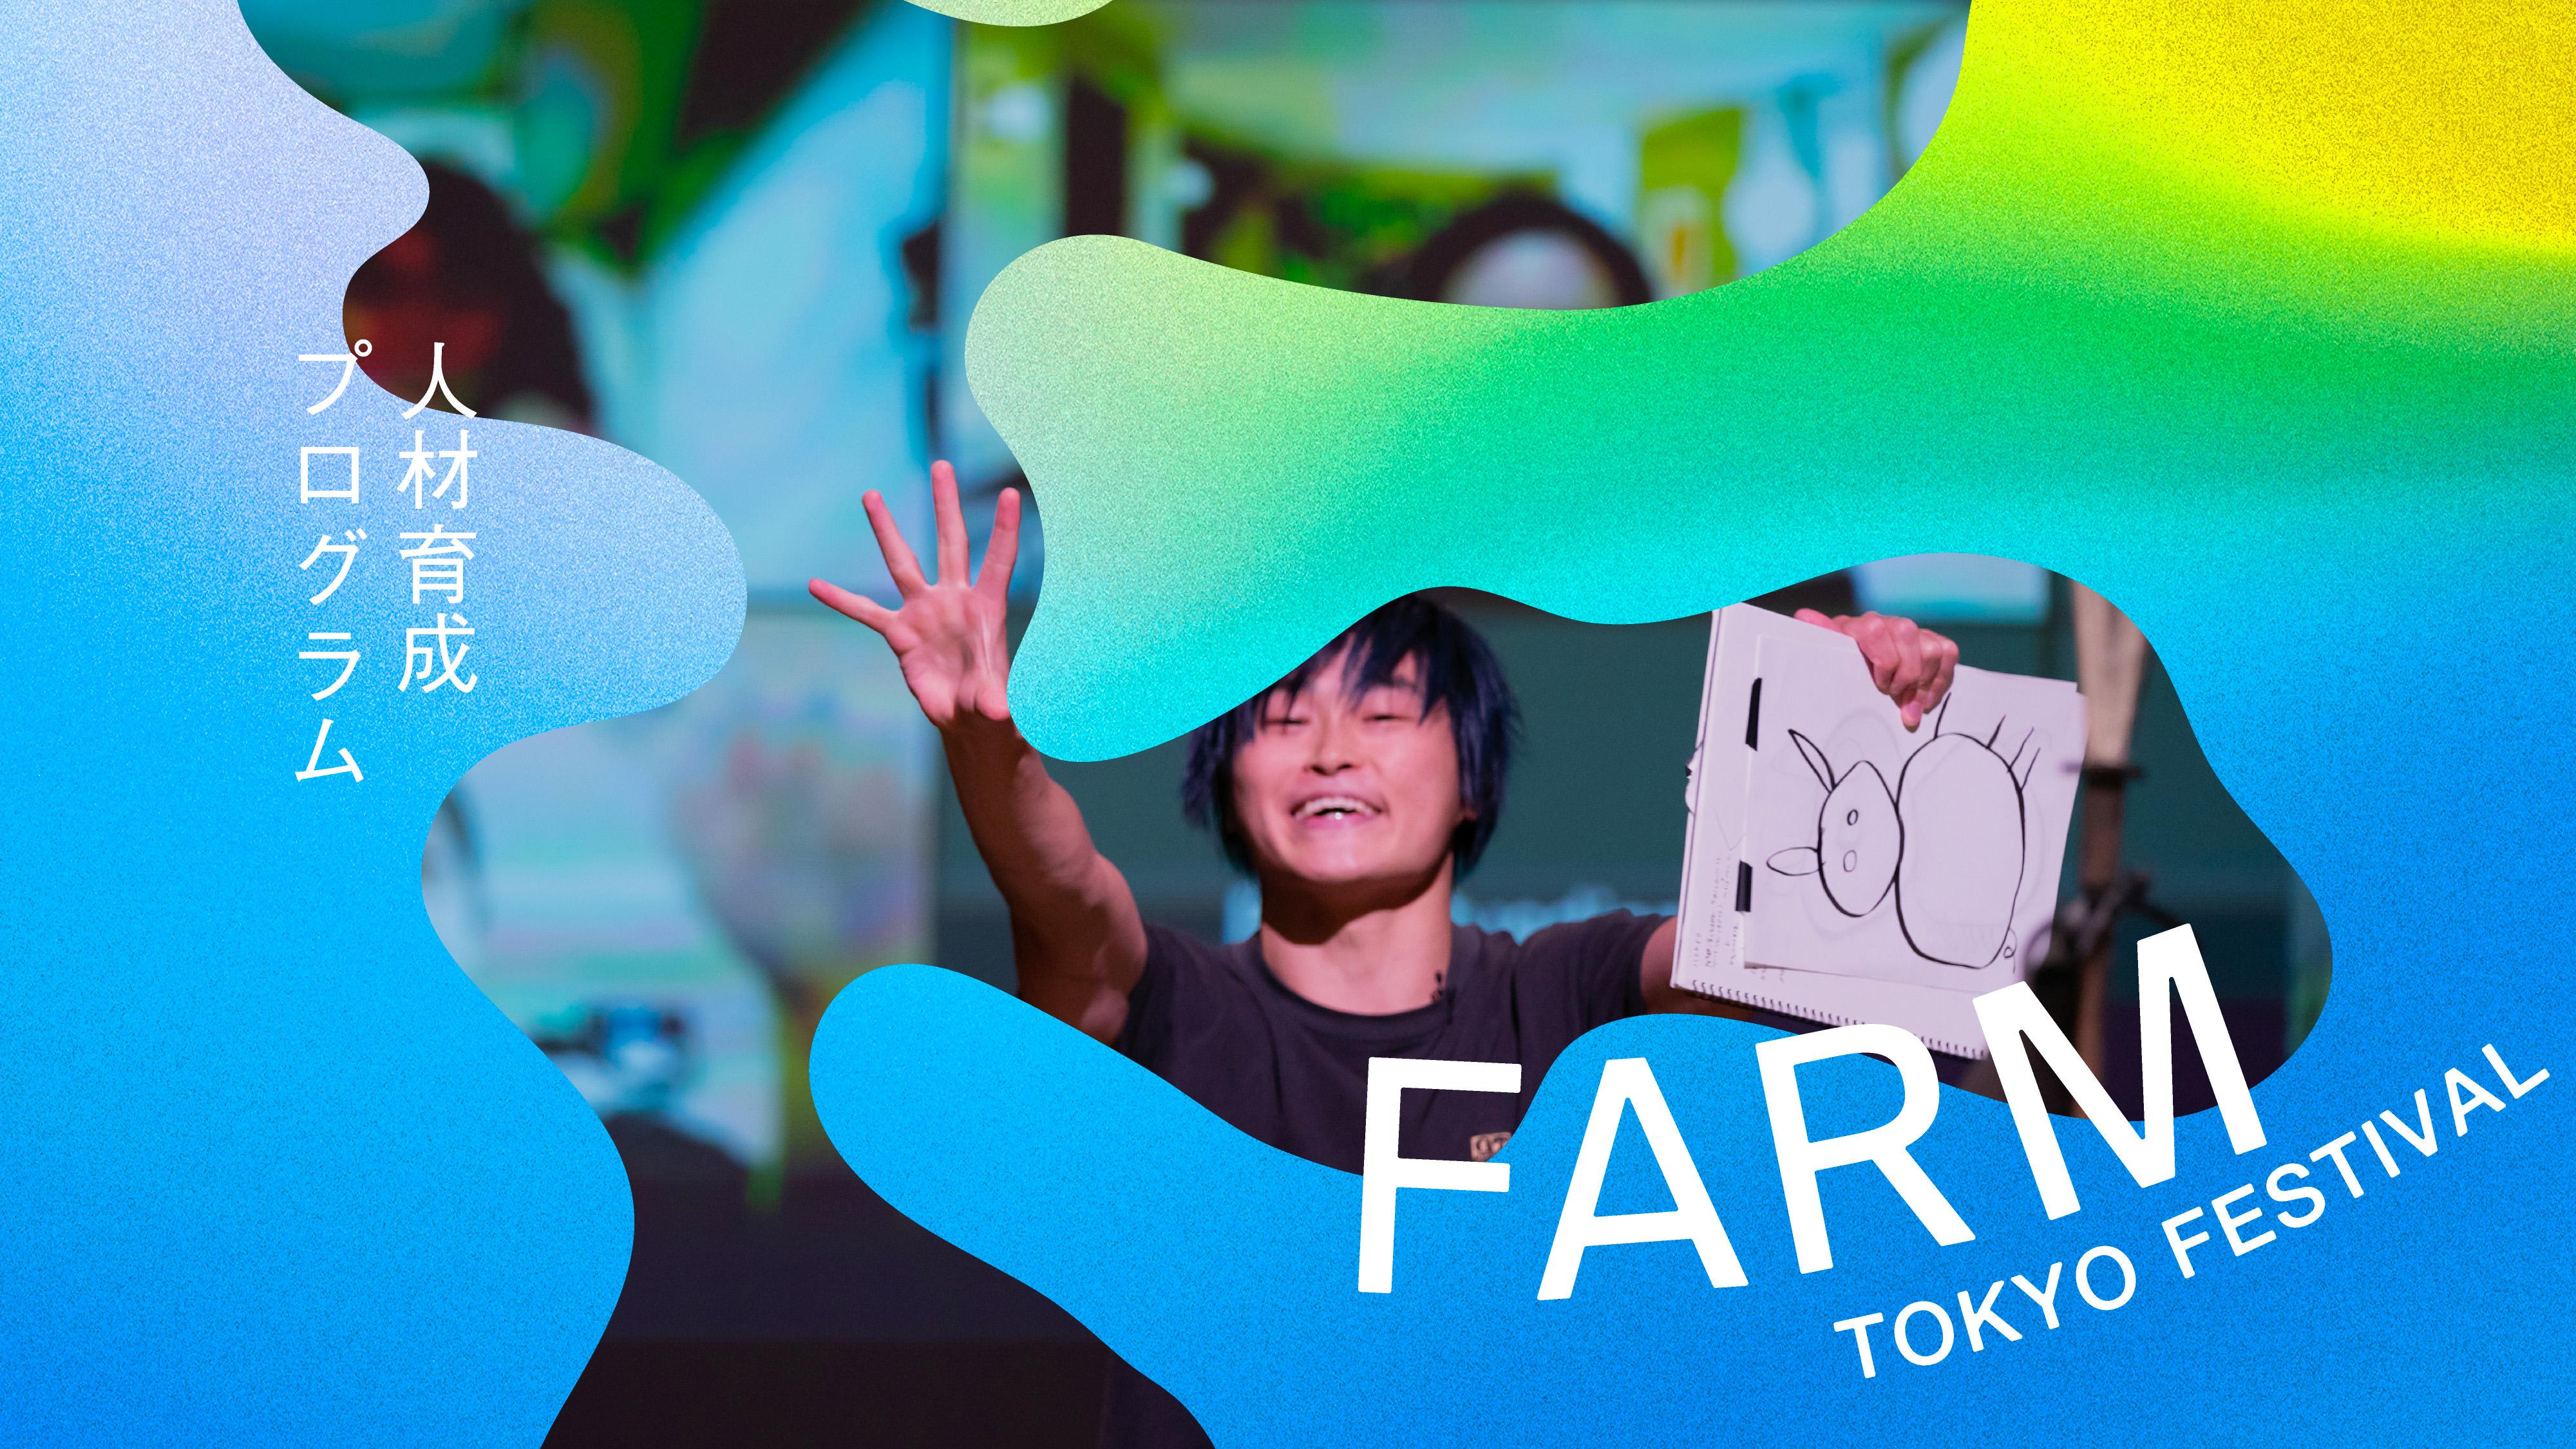 TOKYO FESTIVAL FARM 文化や国境を超えて活躍する人材育成プログラム